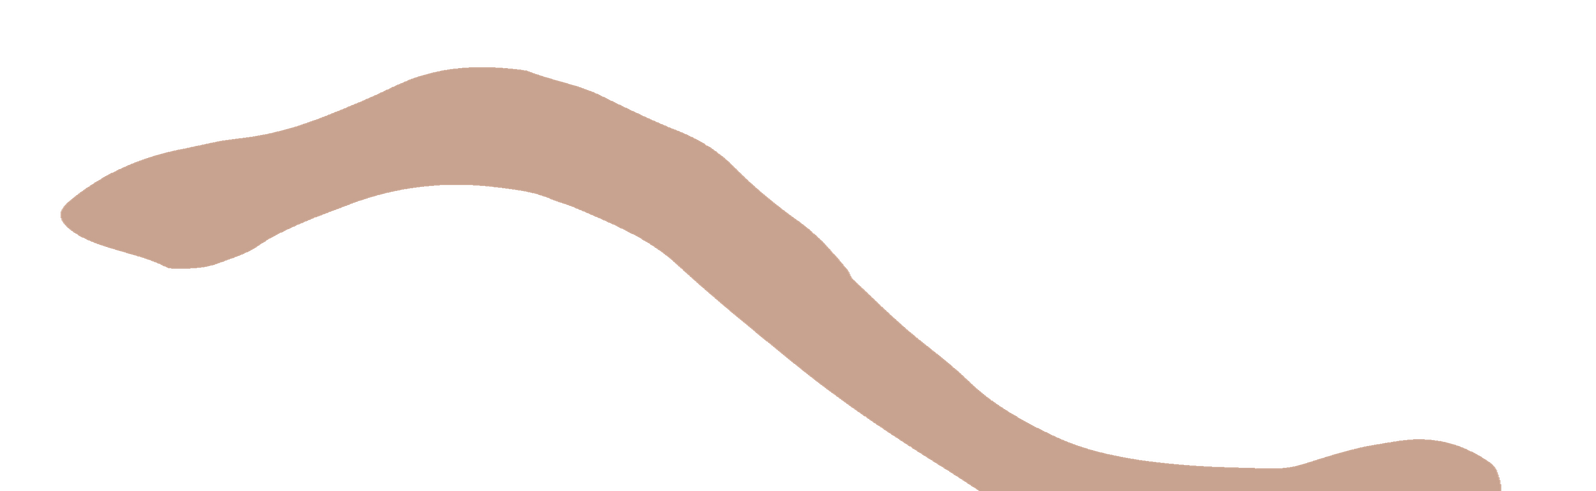 curve blush trans.png